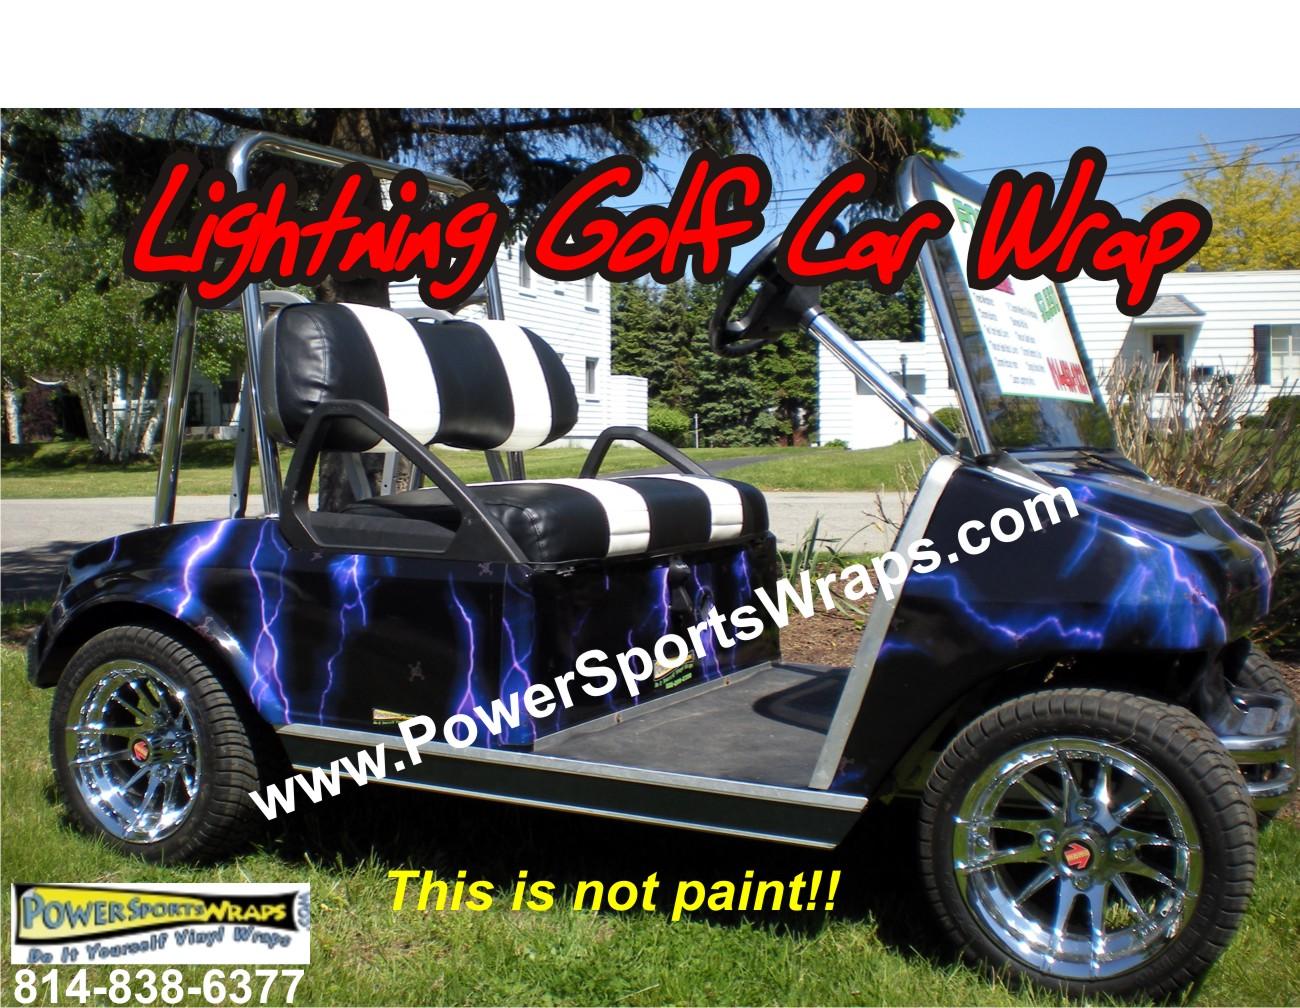 Lightning purple golf car vinyl wrap golf car decals wraps lightning golf cart vinyl wrap for under 40000 wow save do it yourself apply solutioingenieria Choice Image